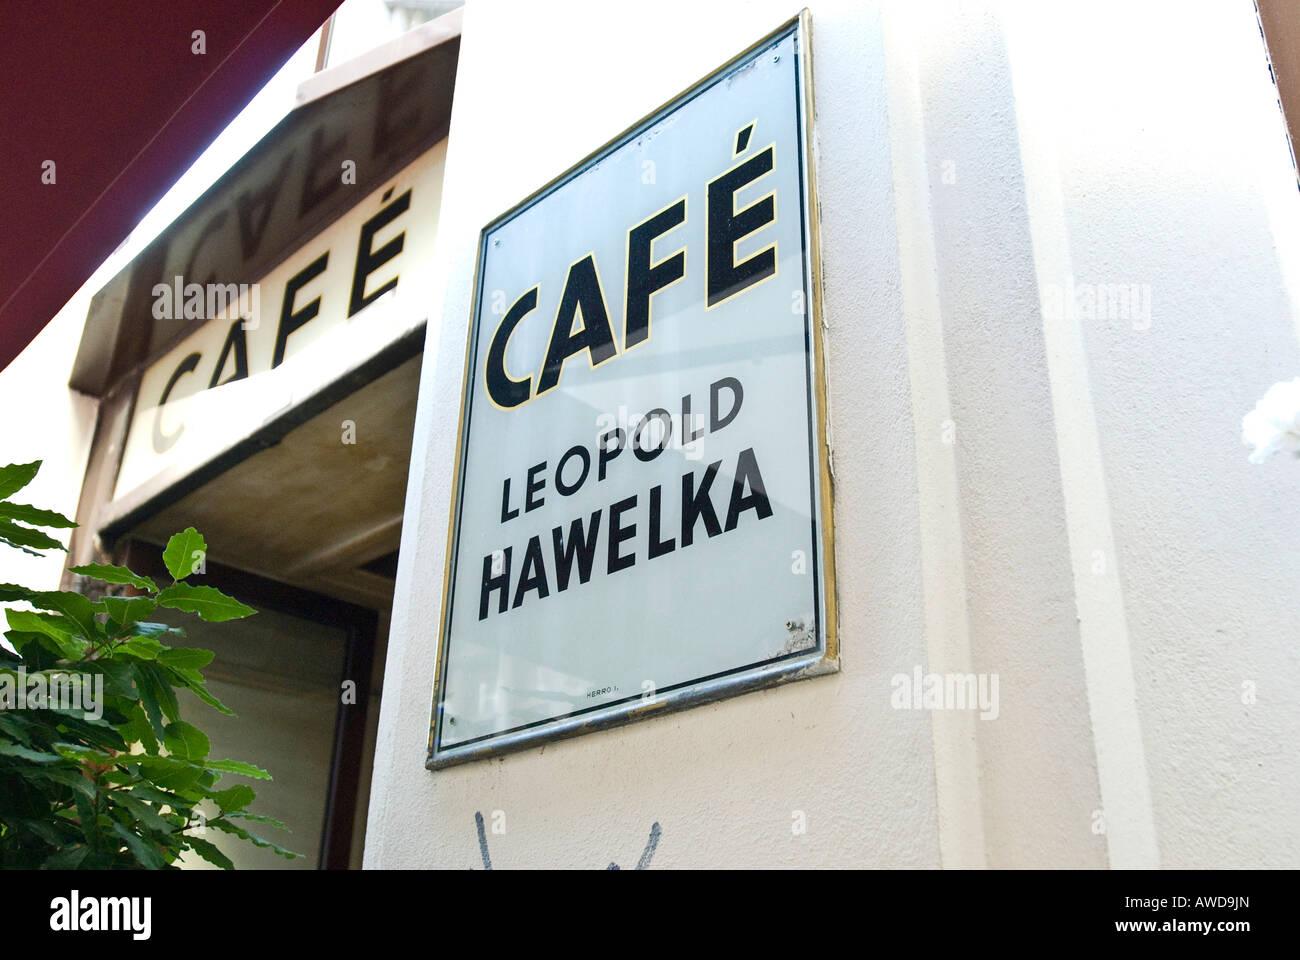 Cafe Hawelka, Wien, Österreich Stockbild